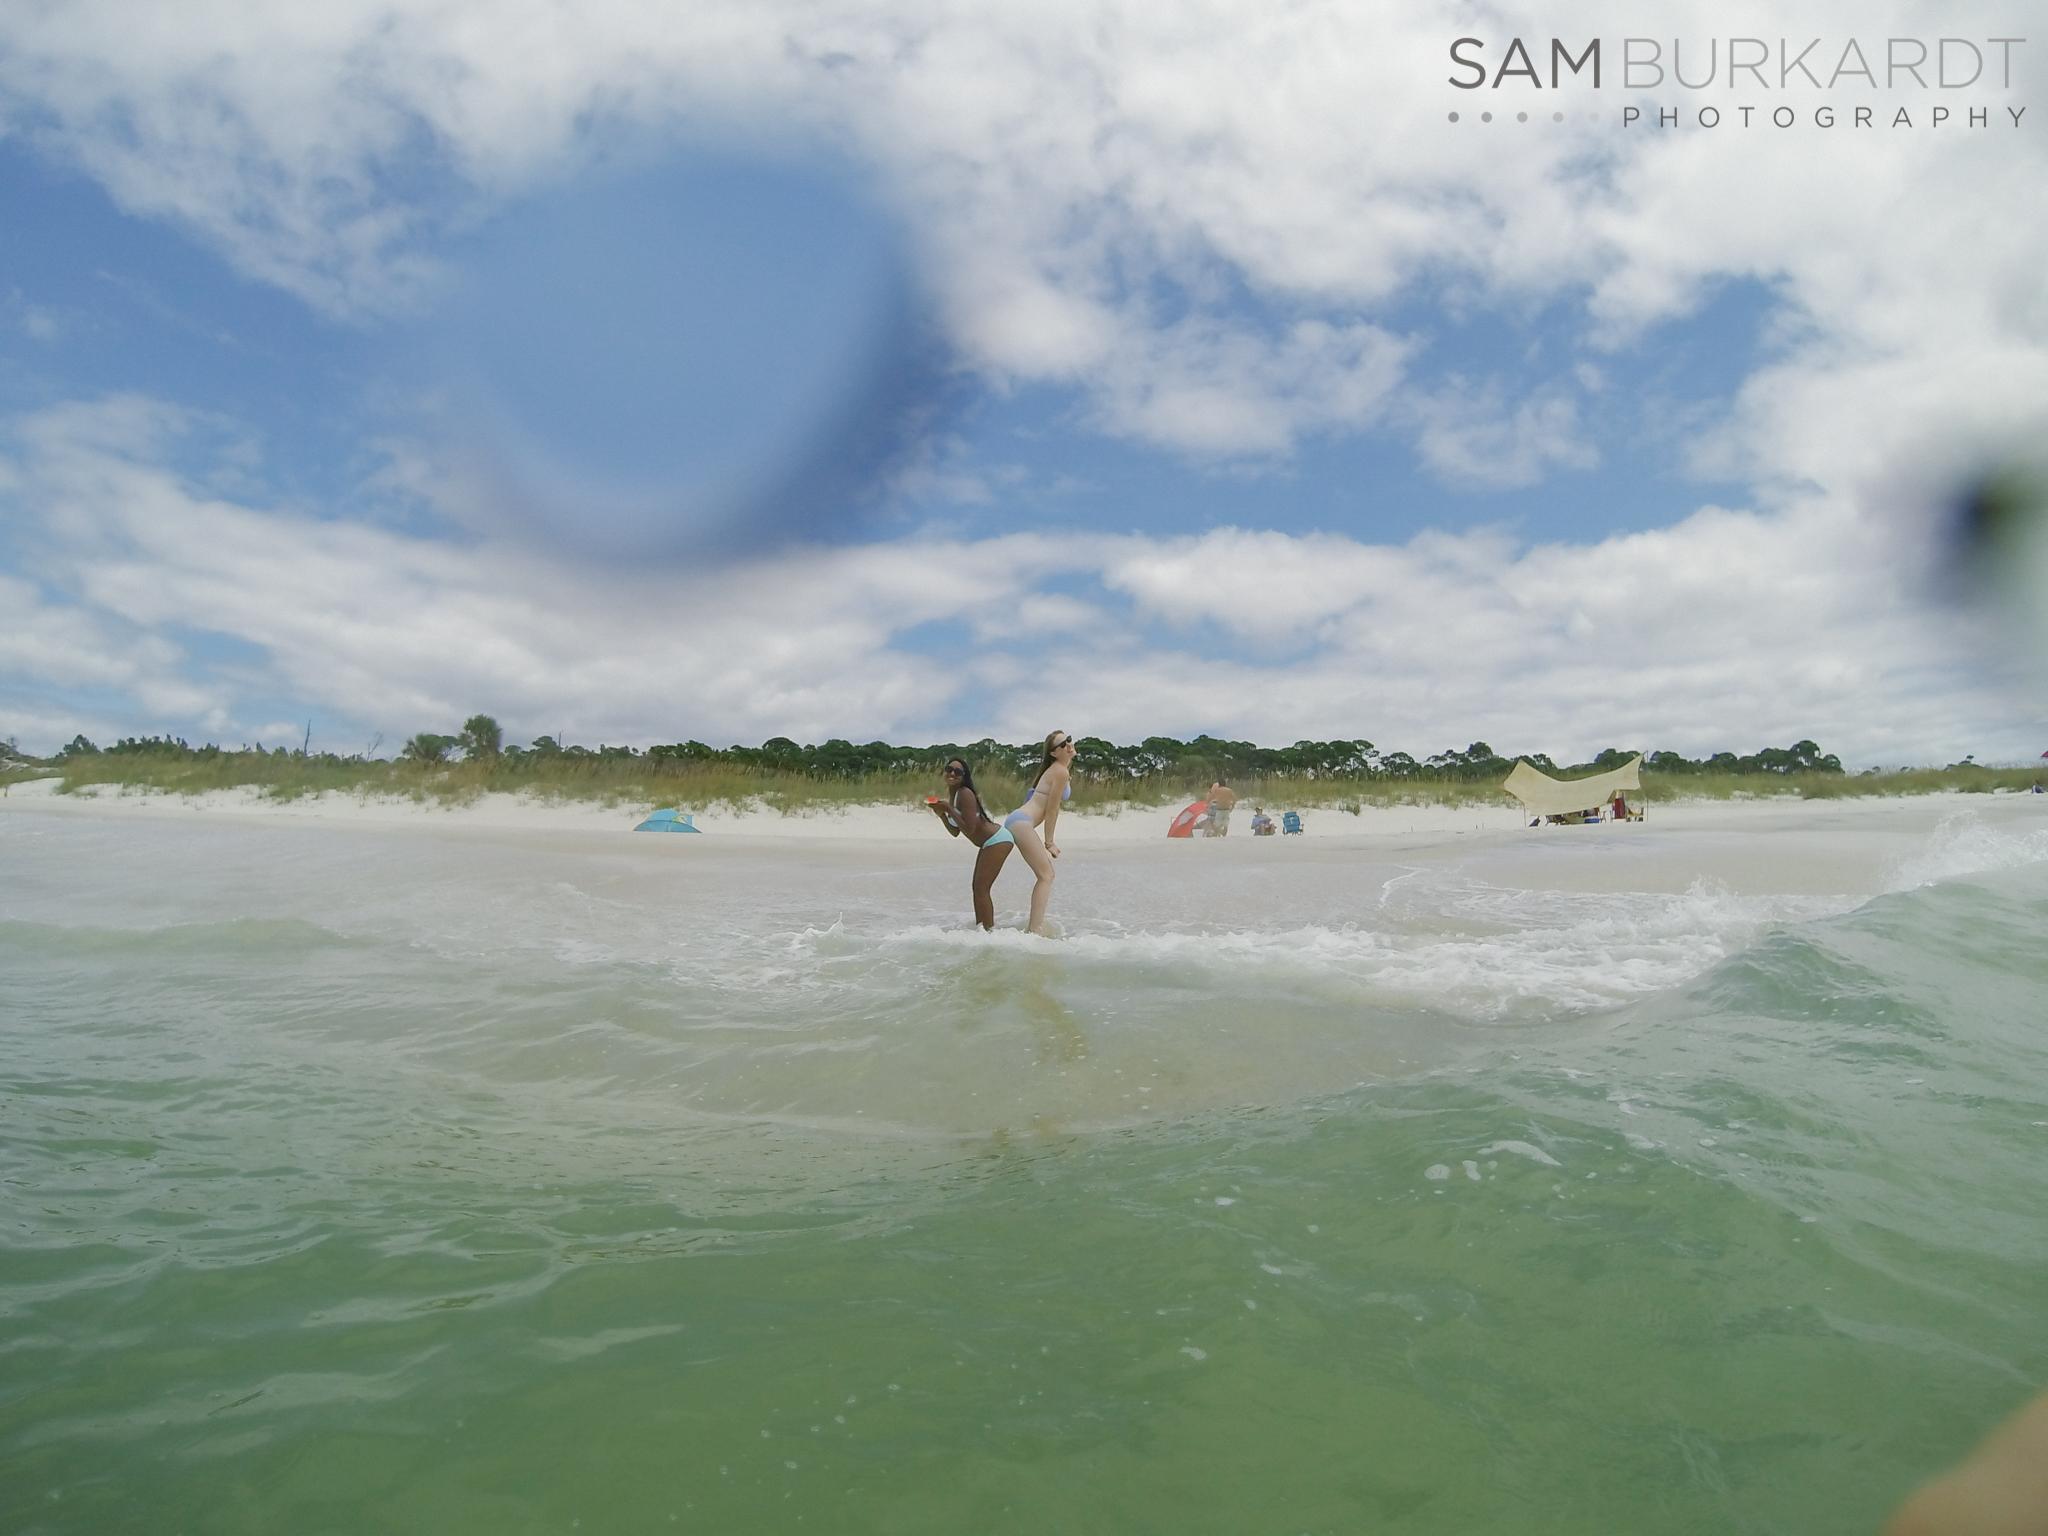 samburkardt_engagement_vacation_beach_cape_san_blas_florida_camping_gopro_0030.jpg